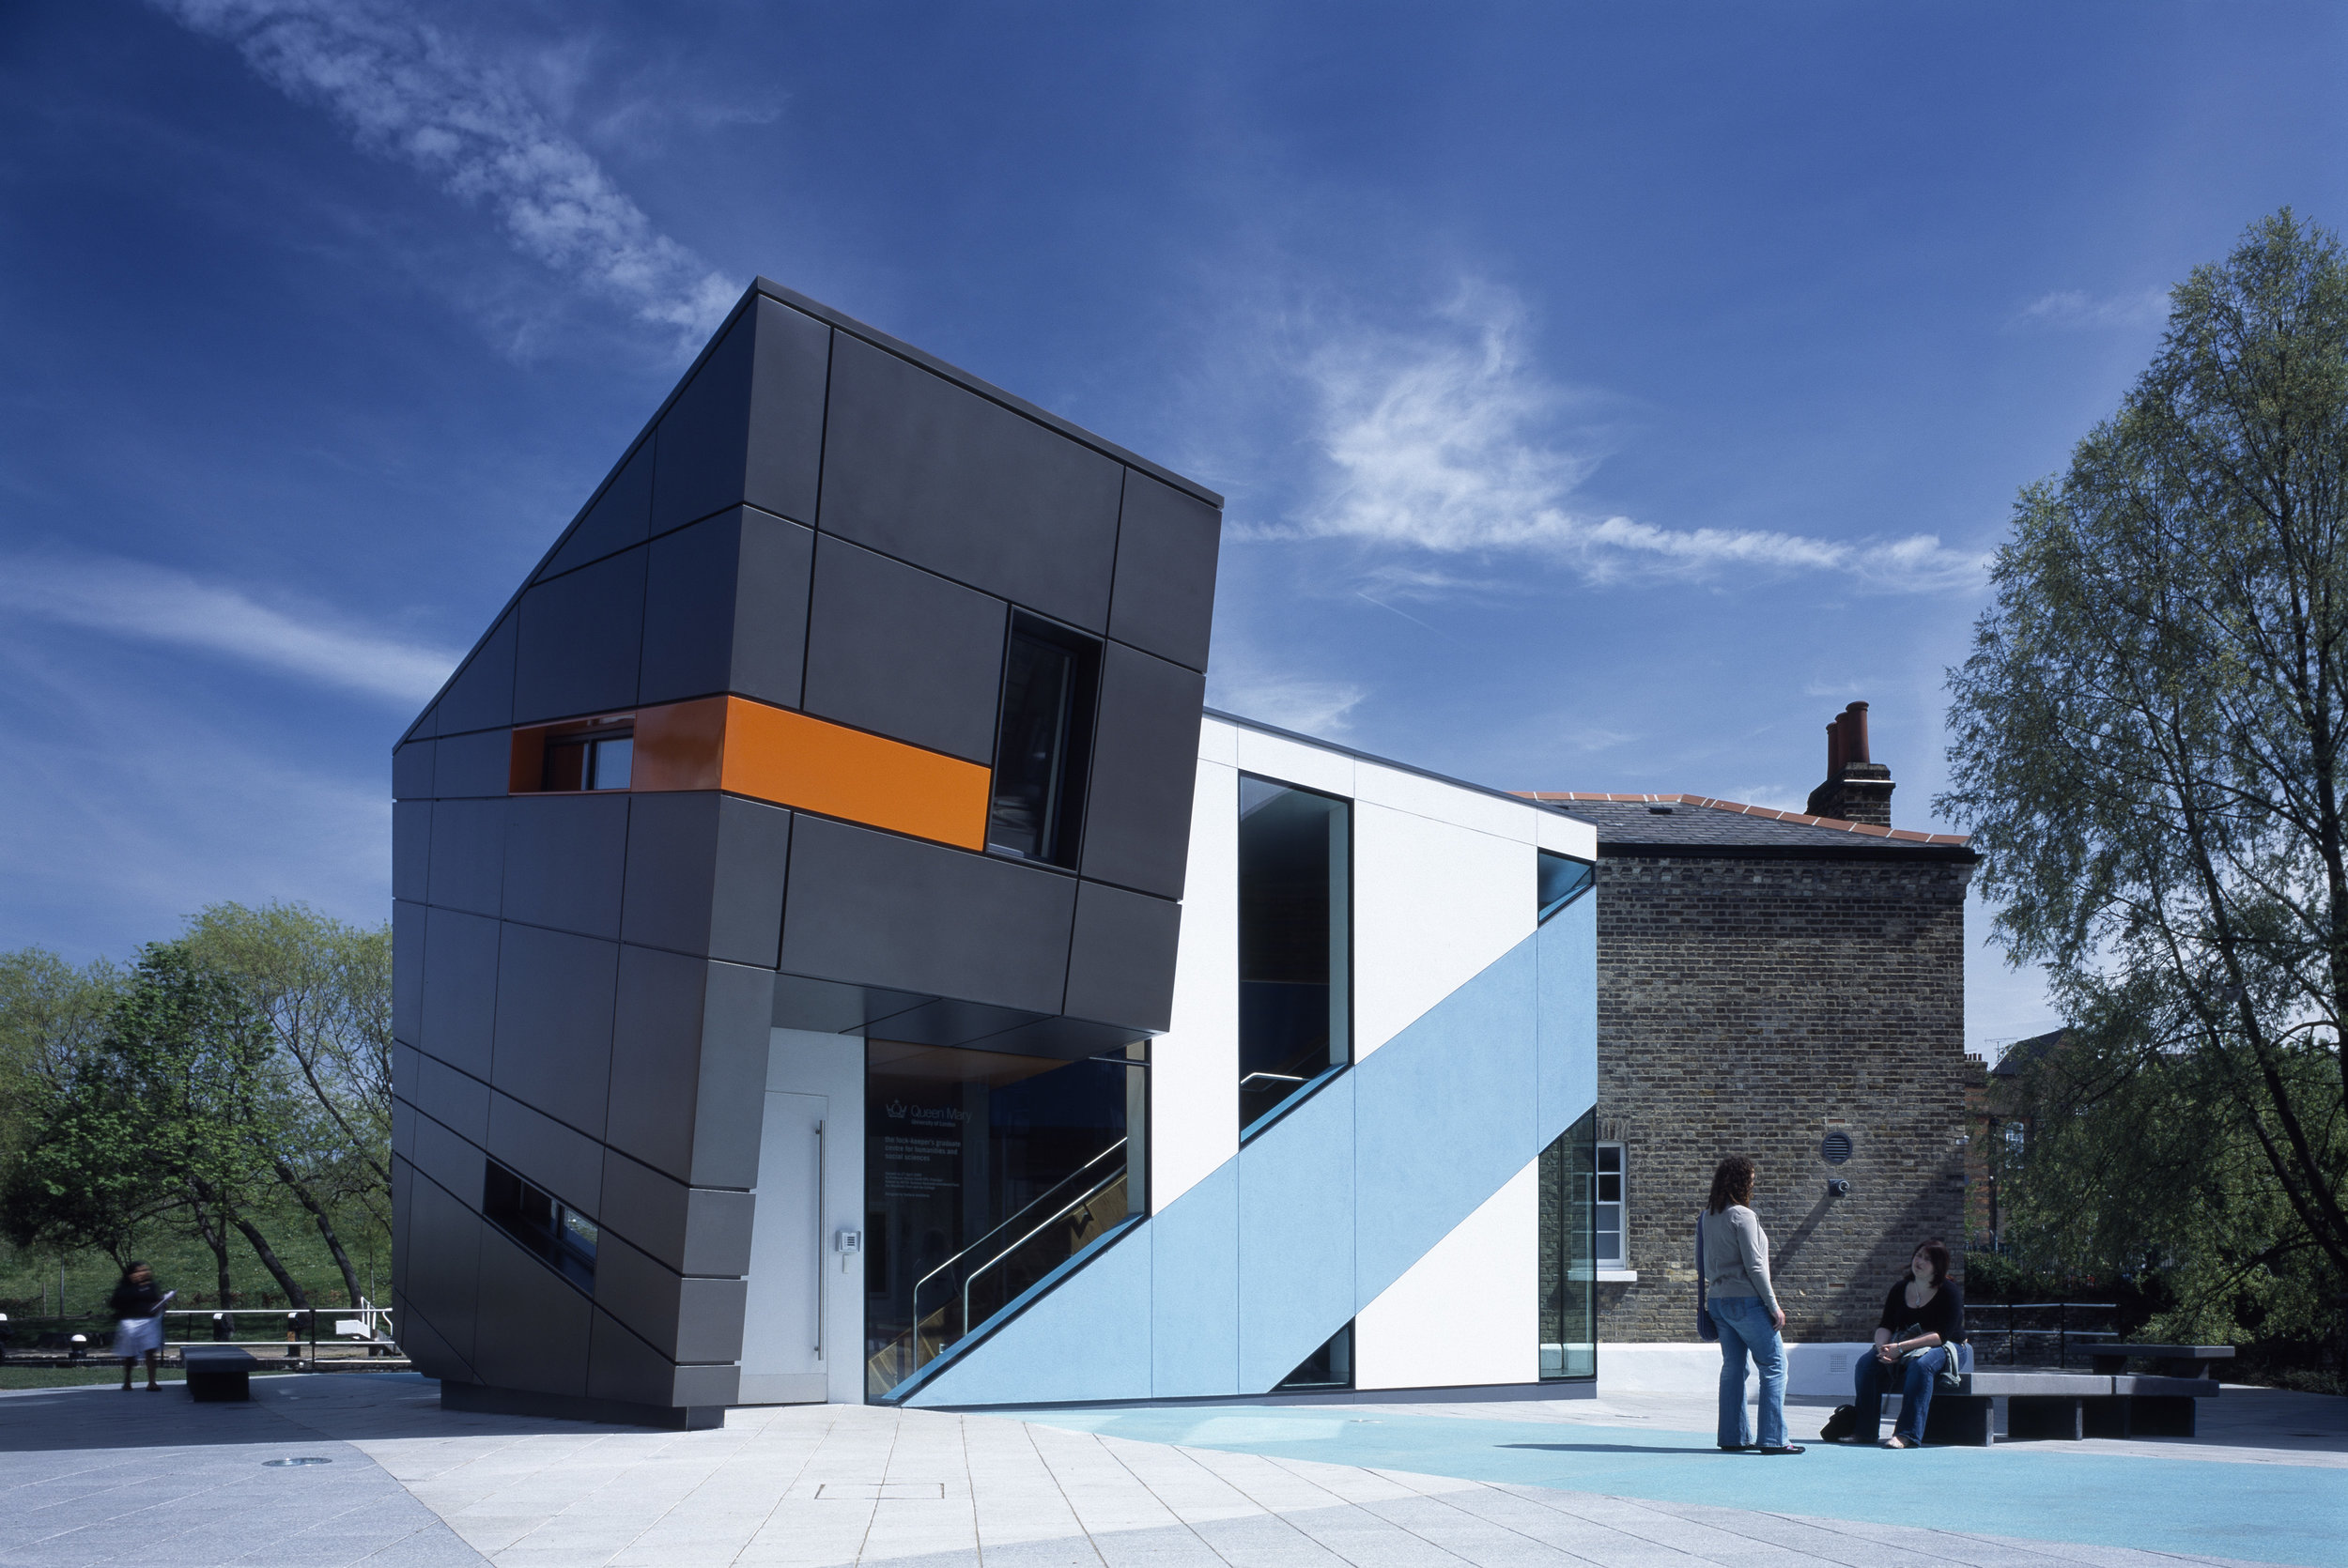 QMUL Lockkeepers Graduate Centre